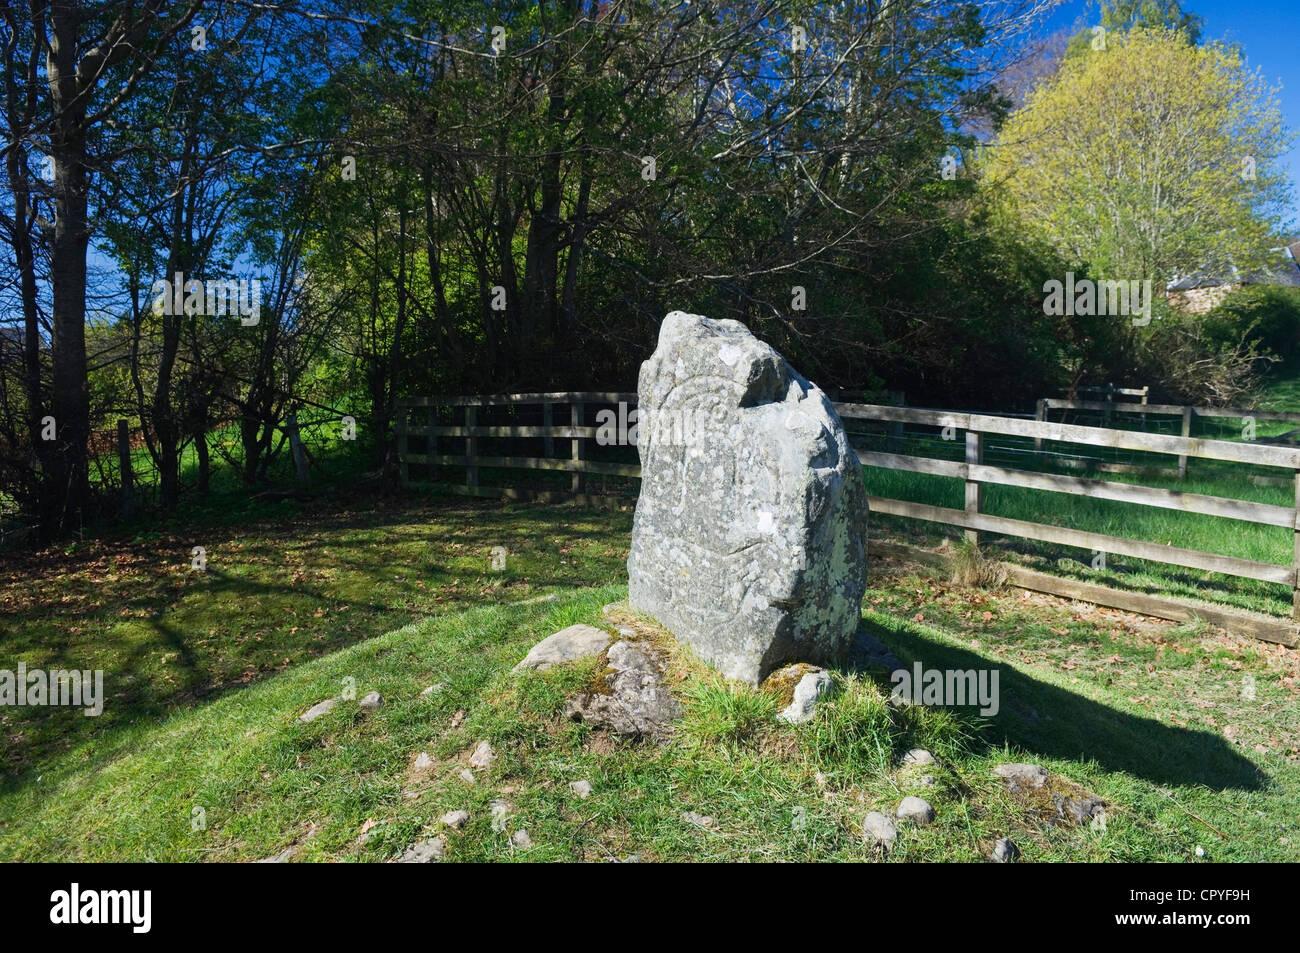 The Eagle Stone, Strathpeffer, Ross-shire, Scotland. Stock Photo